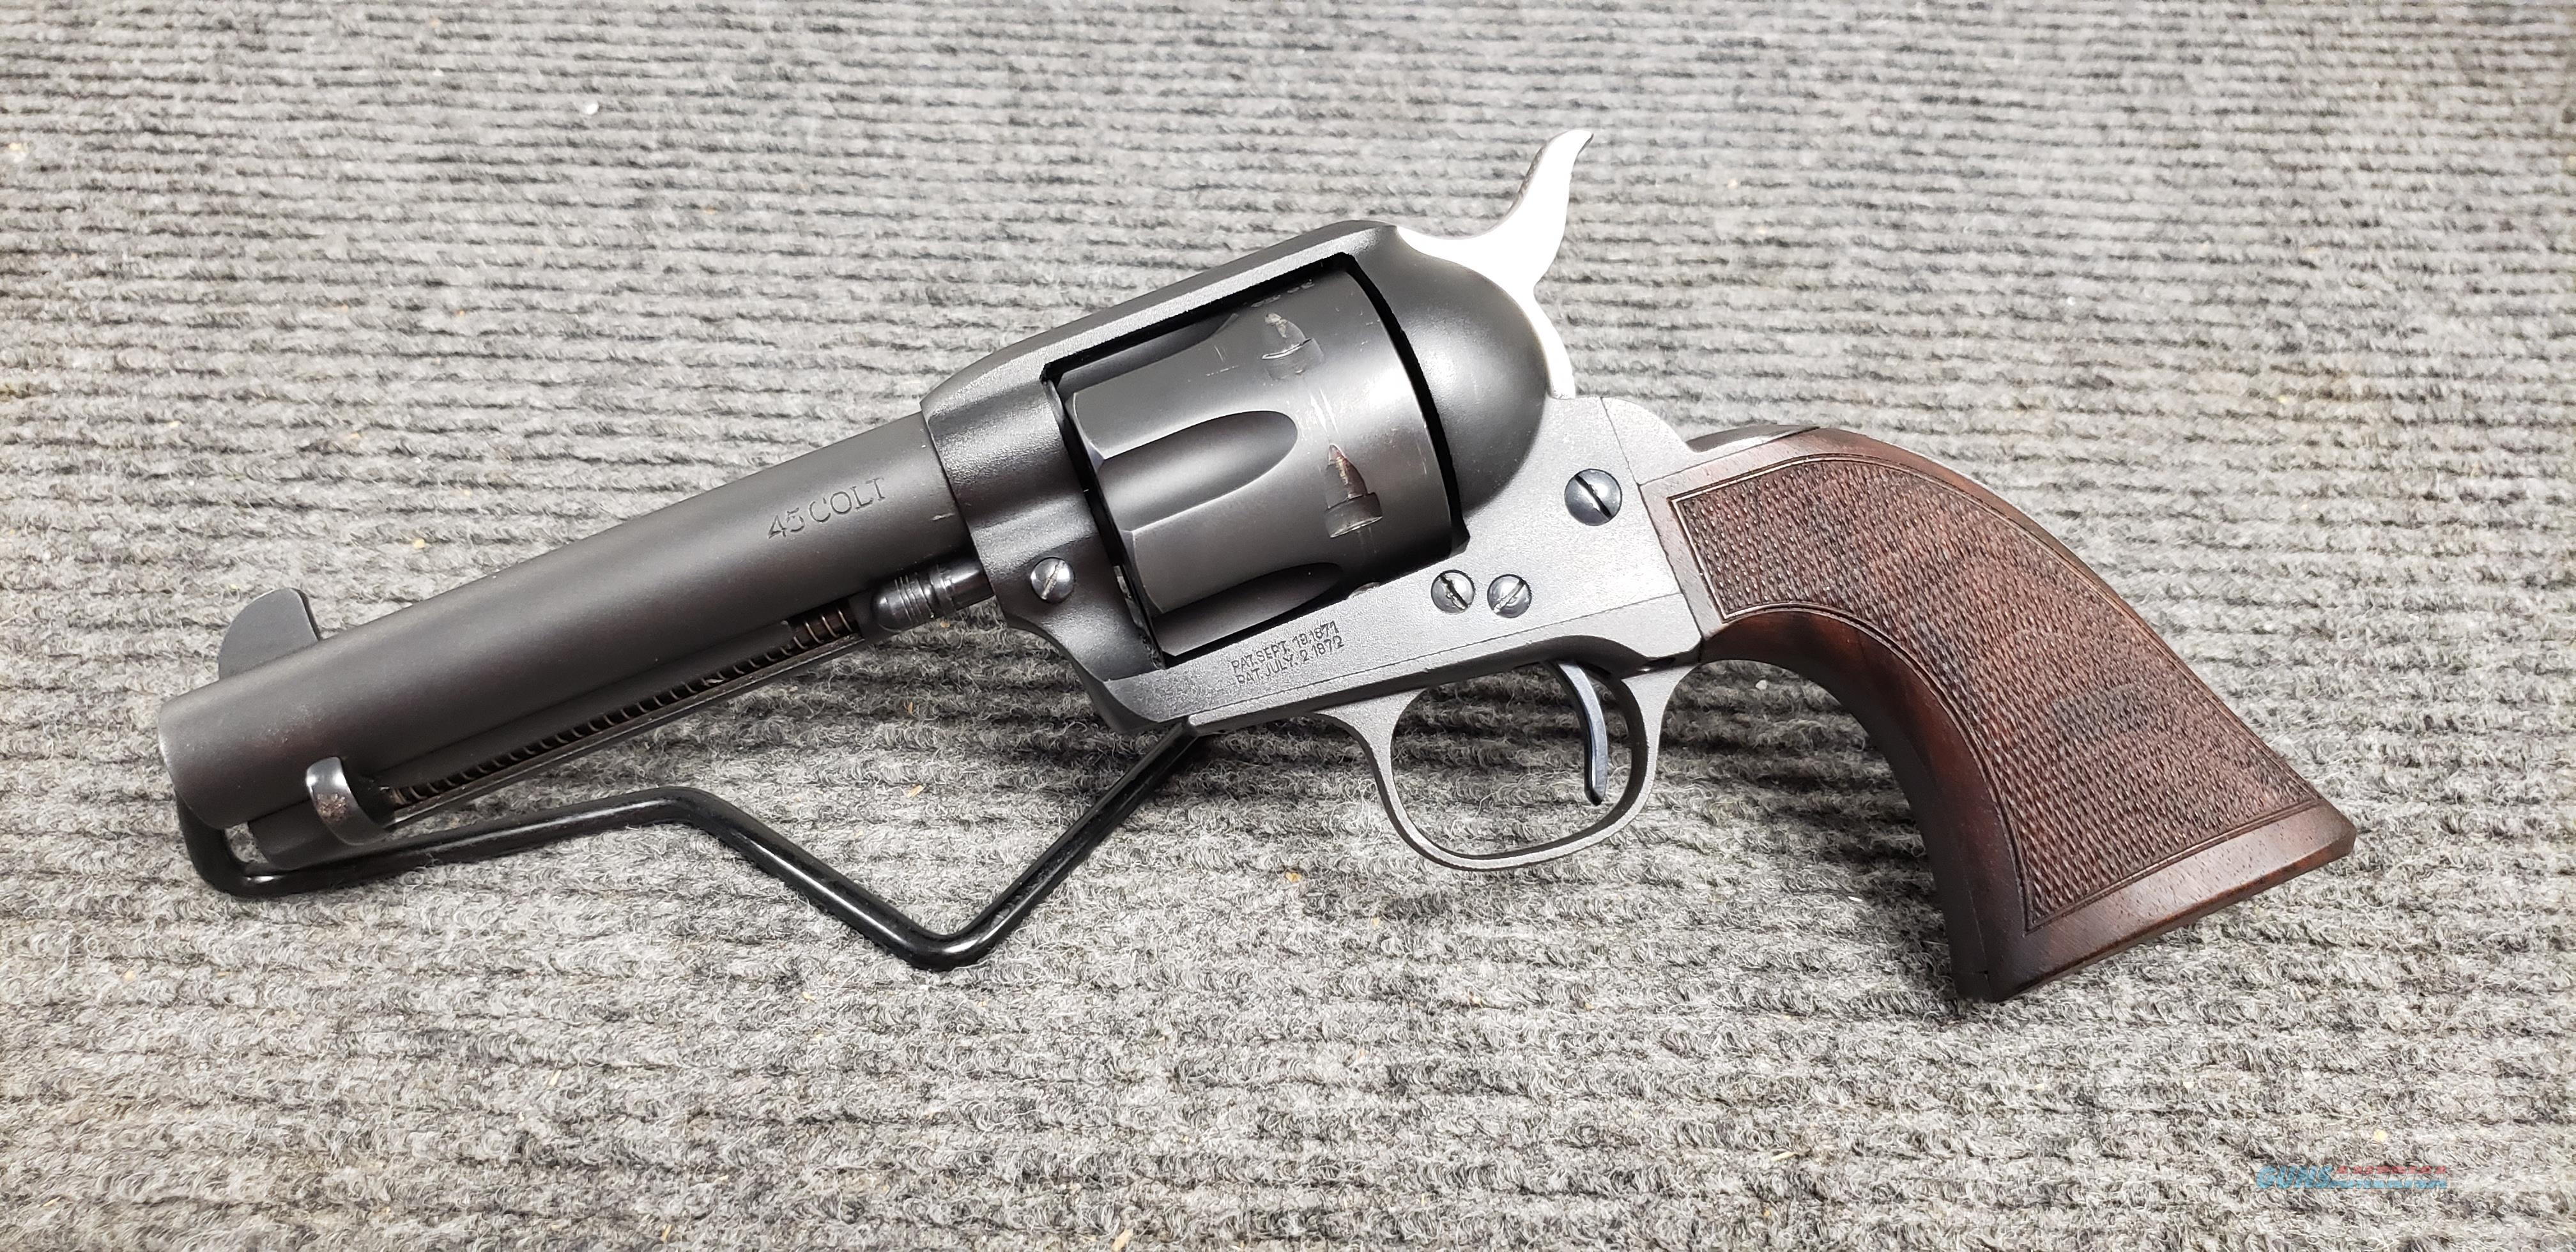 Uberti Cattleman .45Colt Revolver *LAYAWAY AVAILABLE*  Guns > Pistols > Uberti Pistols > Ctg.